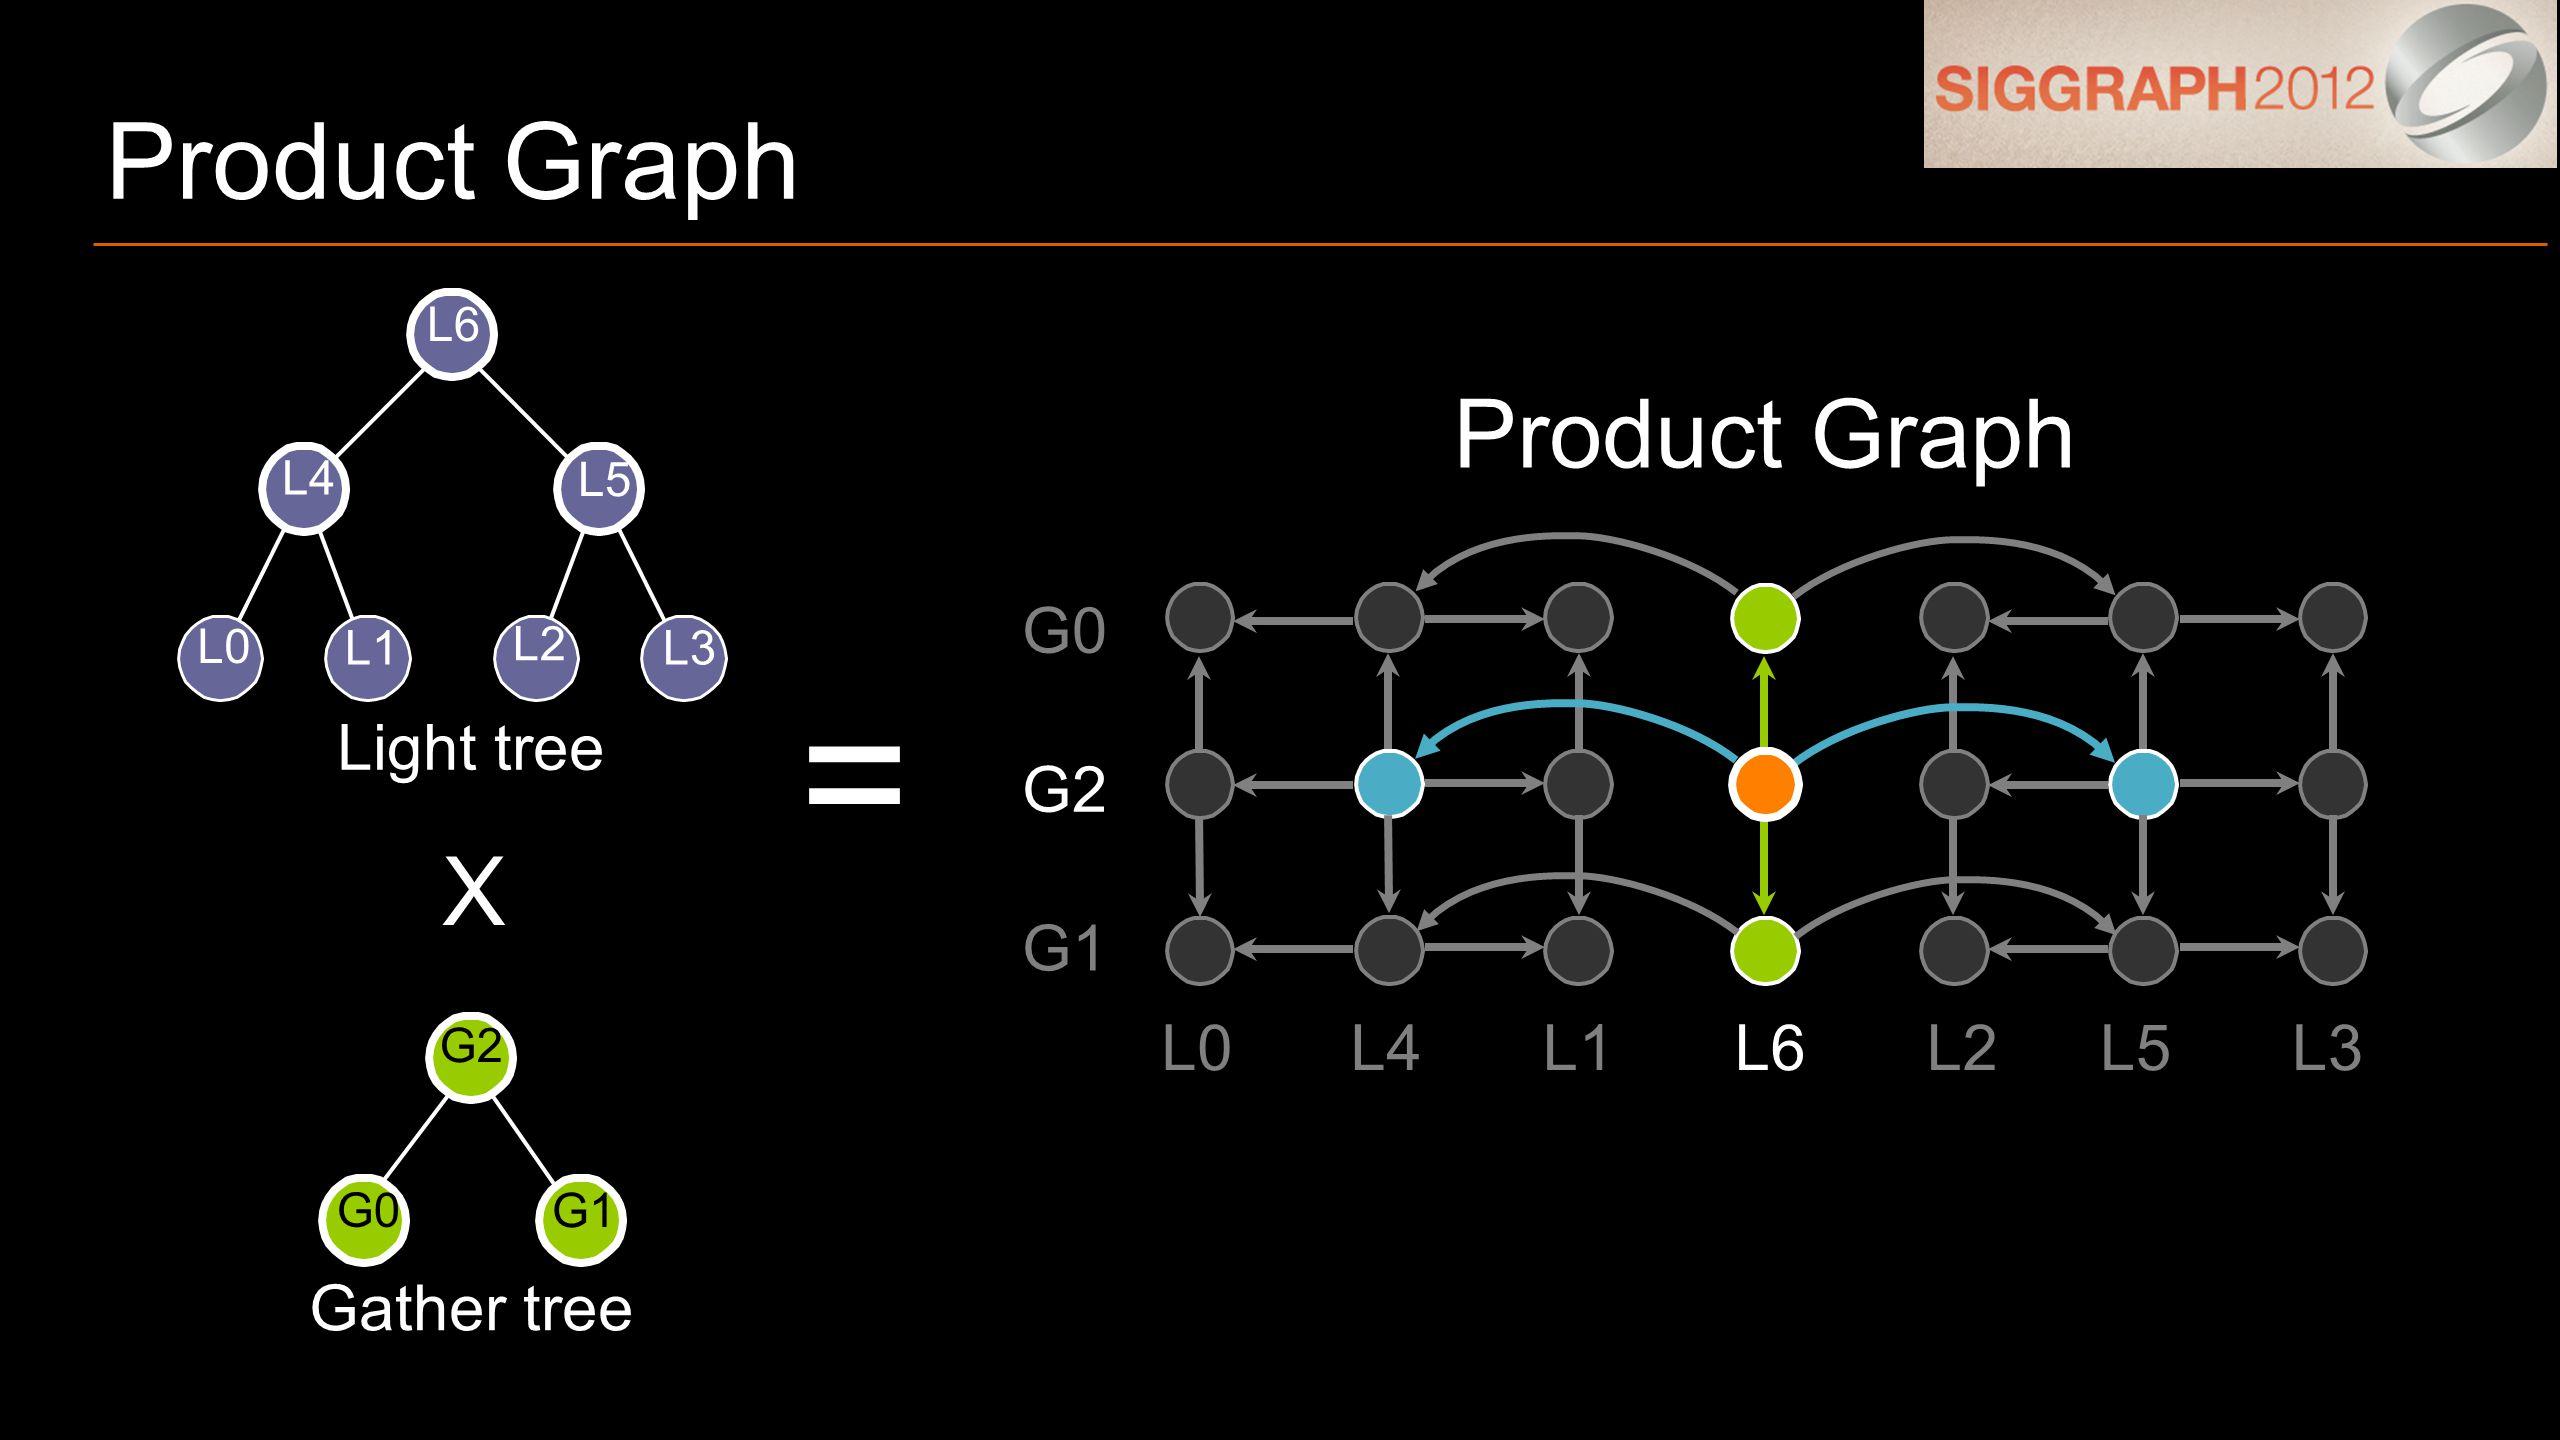 Product Graph = G1 G0 G2 L0L4L1L6L2L5L3 Product Graph Light tree Gather tree L0 L1 L2 L3 L4 L5 L6 G1 G0 G2 X